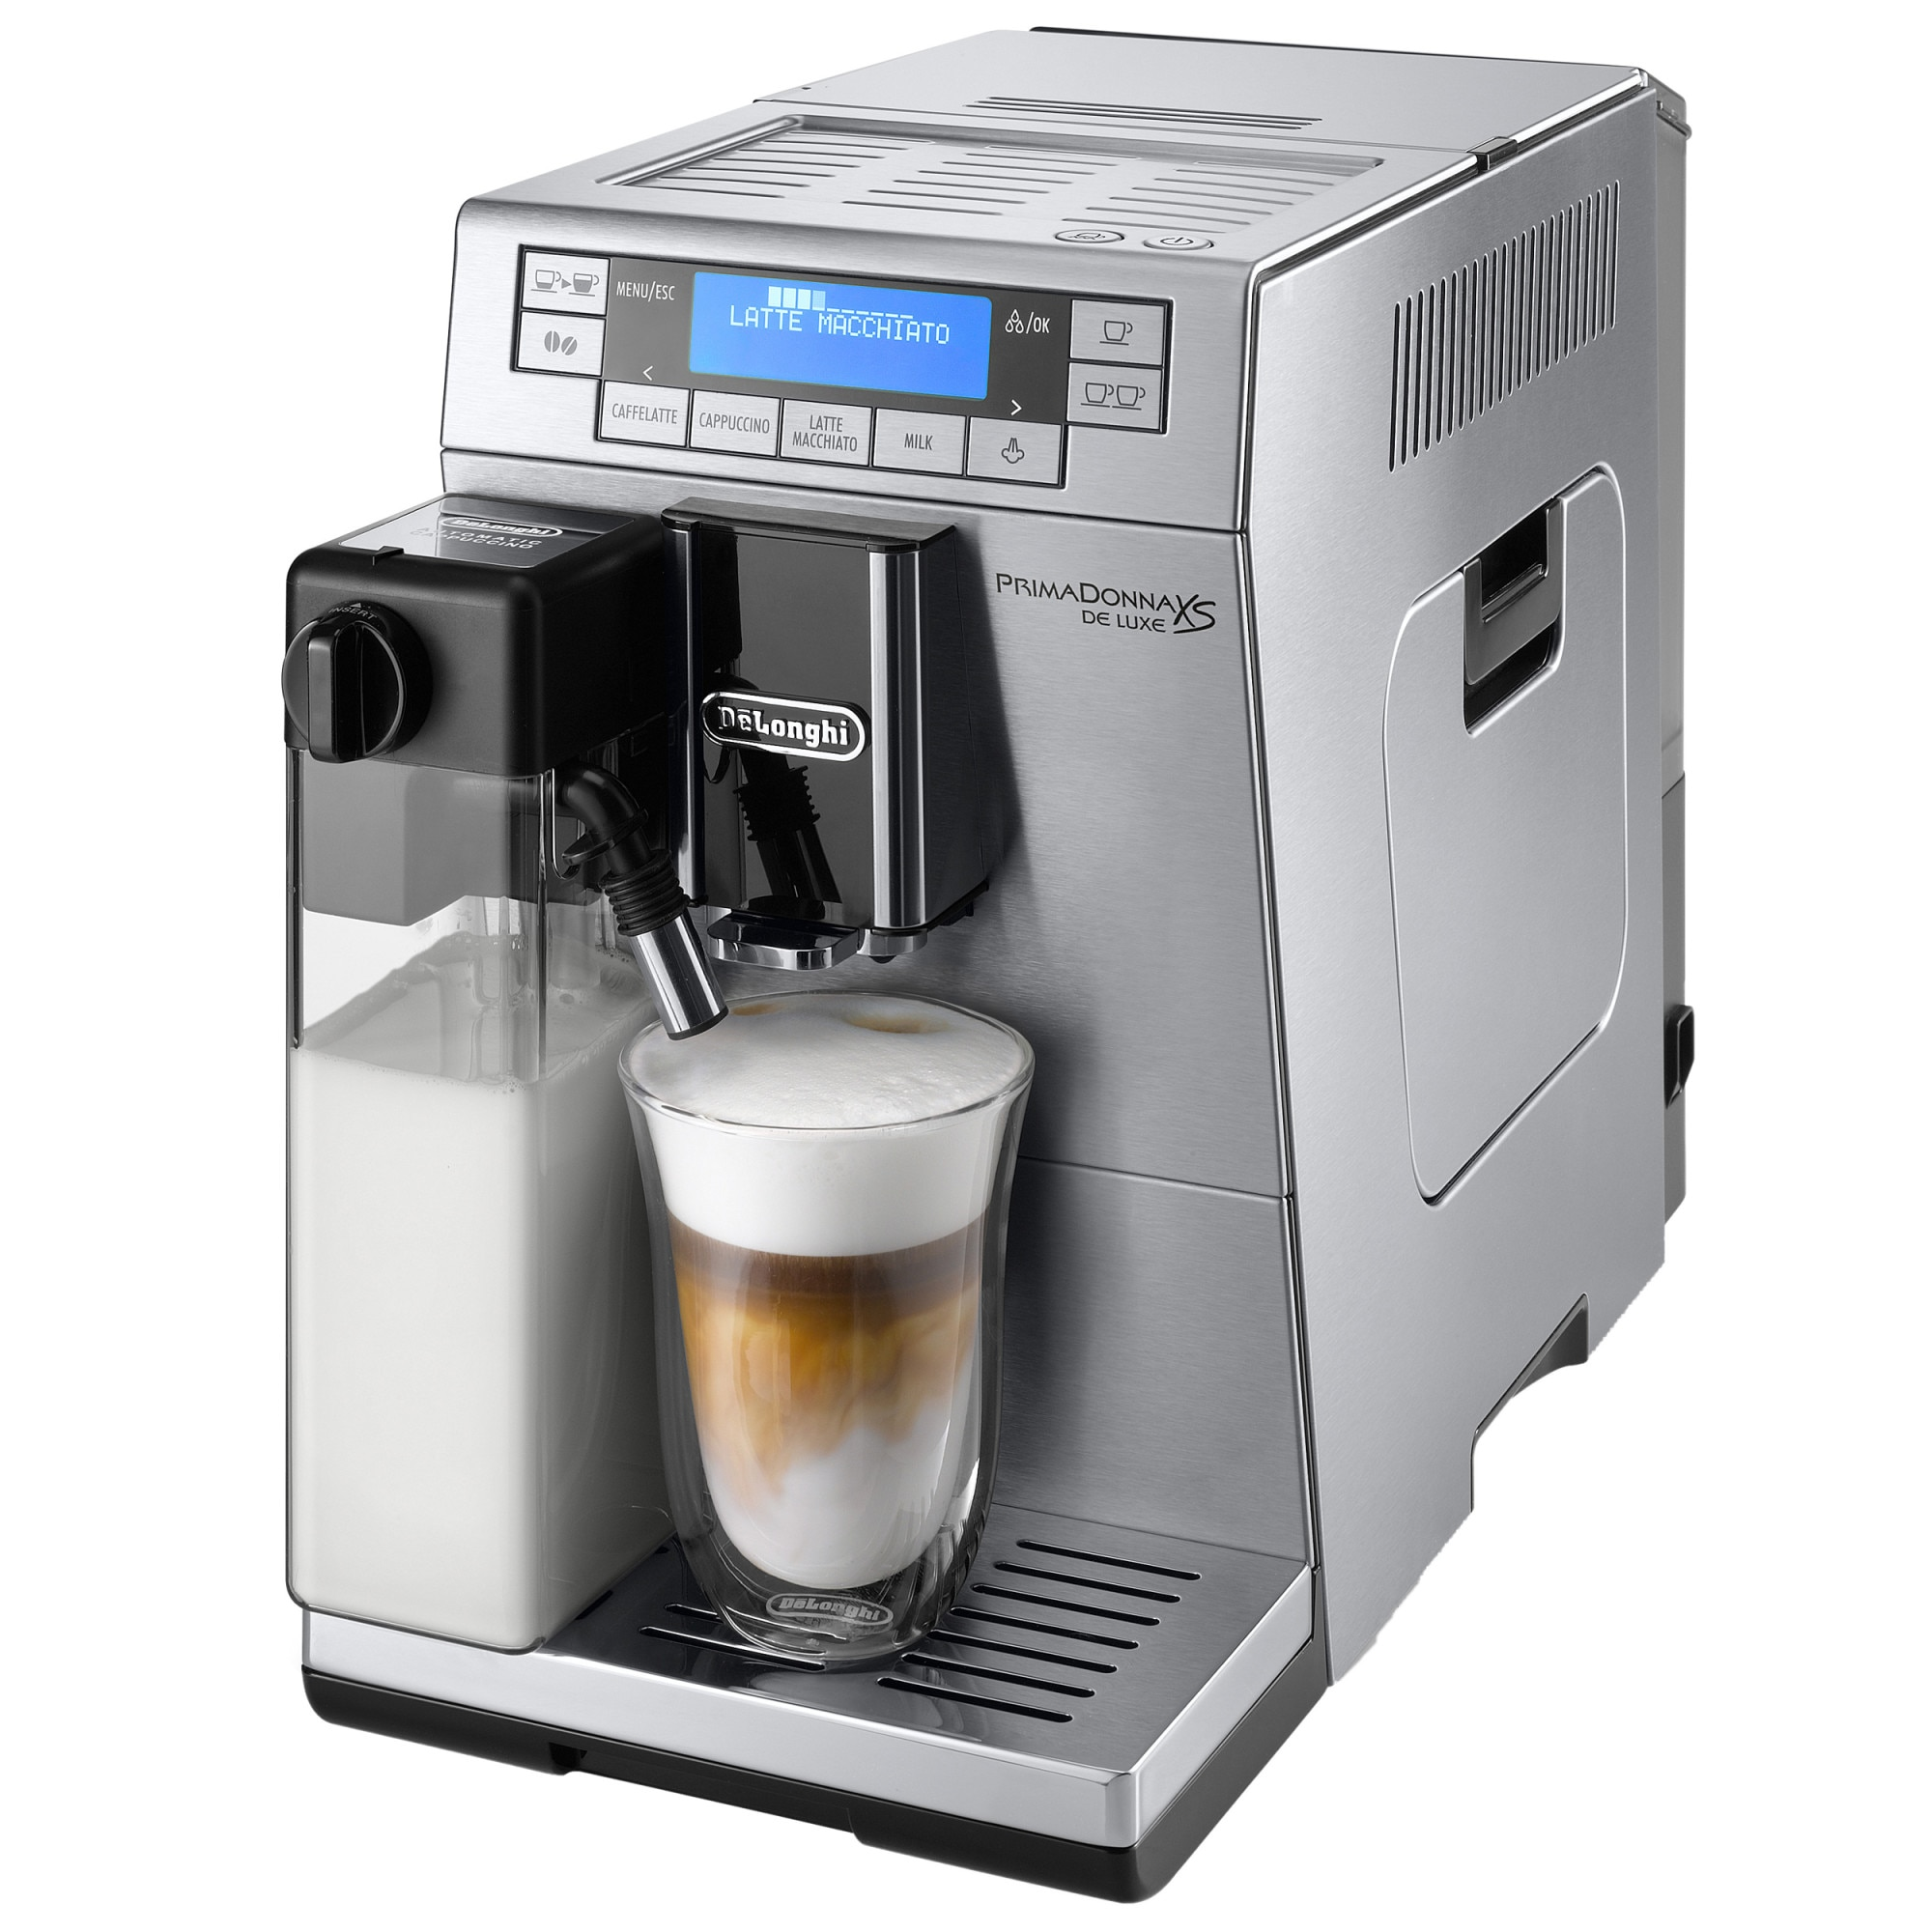 Fotografie Espressor Automat De'Longhi Prima Donna XS De Luxe ETAM 36.365 M, 1450 W, 15 bar, 1.3 L, Argintiu